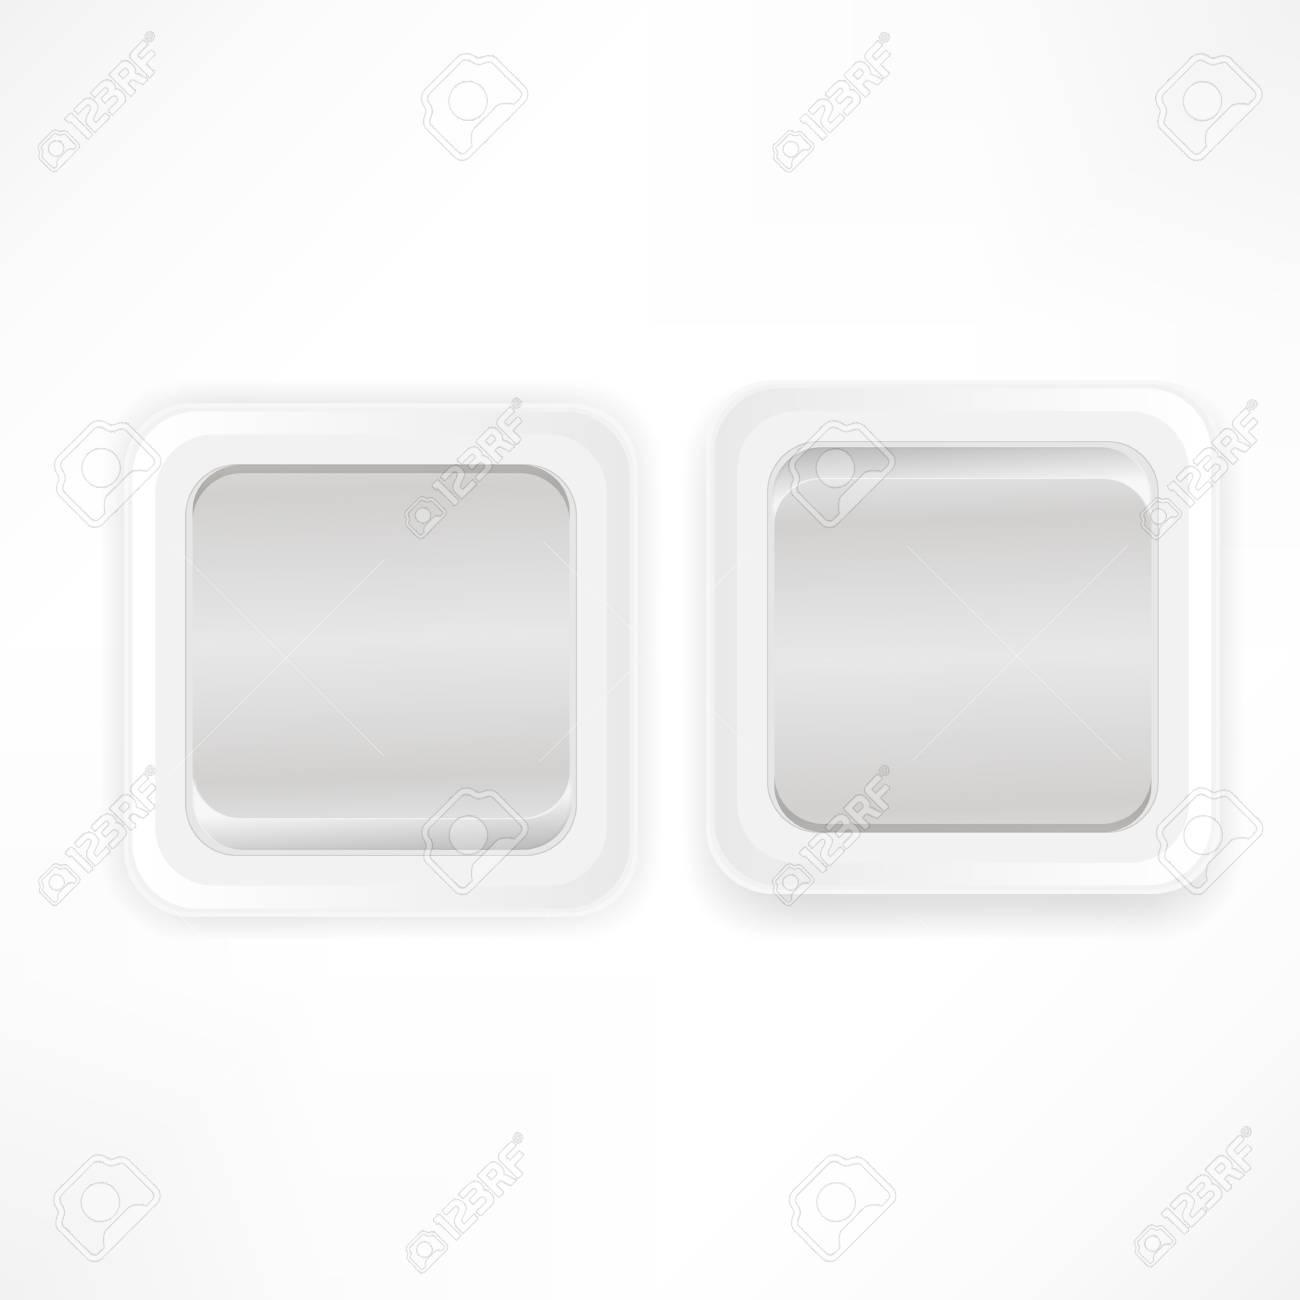 Light switch Stock Vector - 16168826